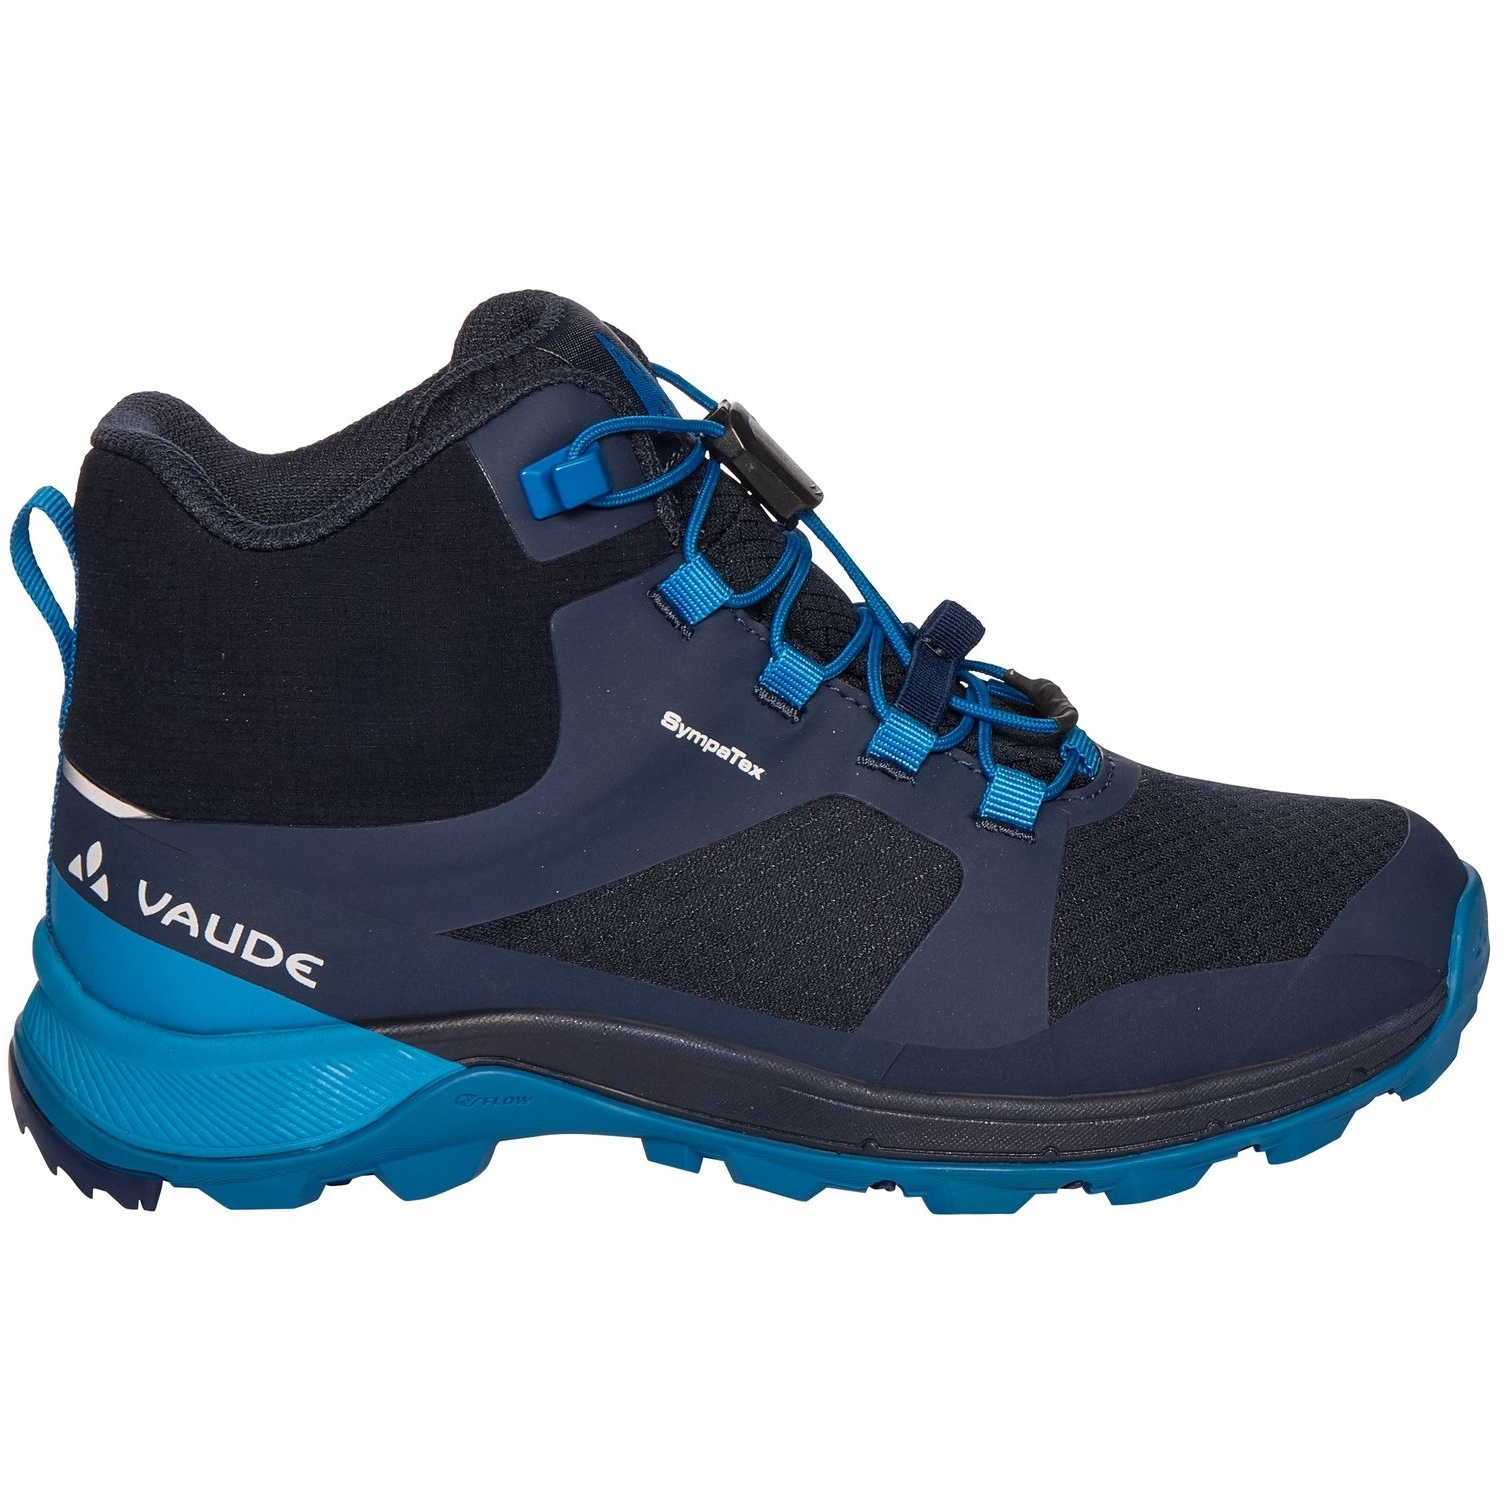 Vaude Kids Lapita II Mid STX Schuhe - radiate blue